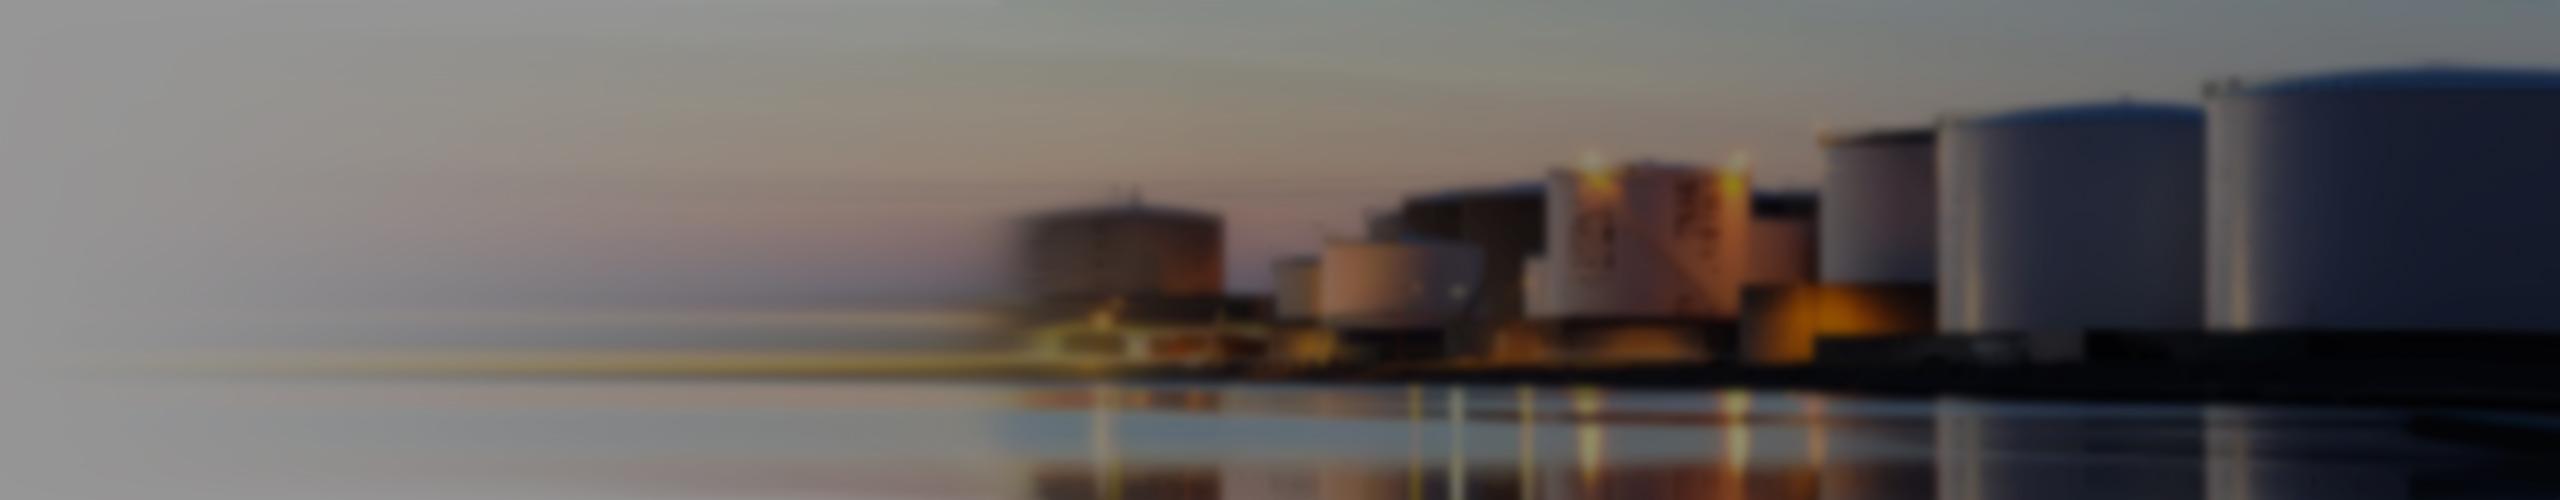 slider-img-fueloffice-oil-bg2